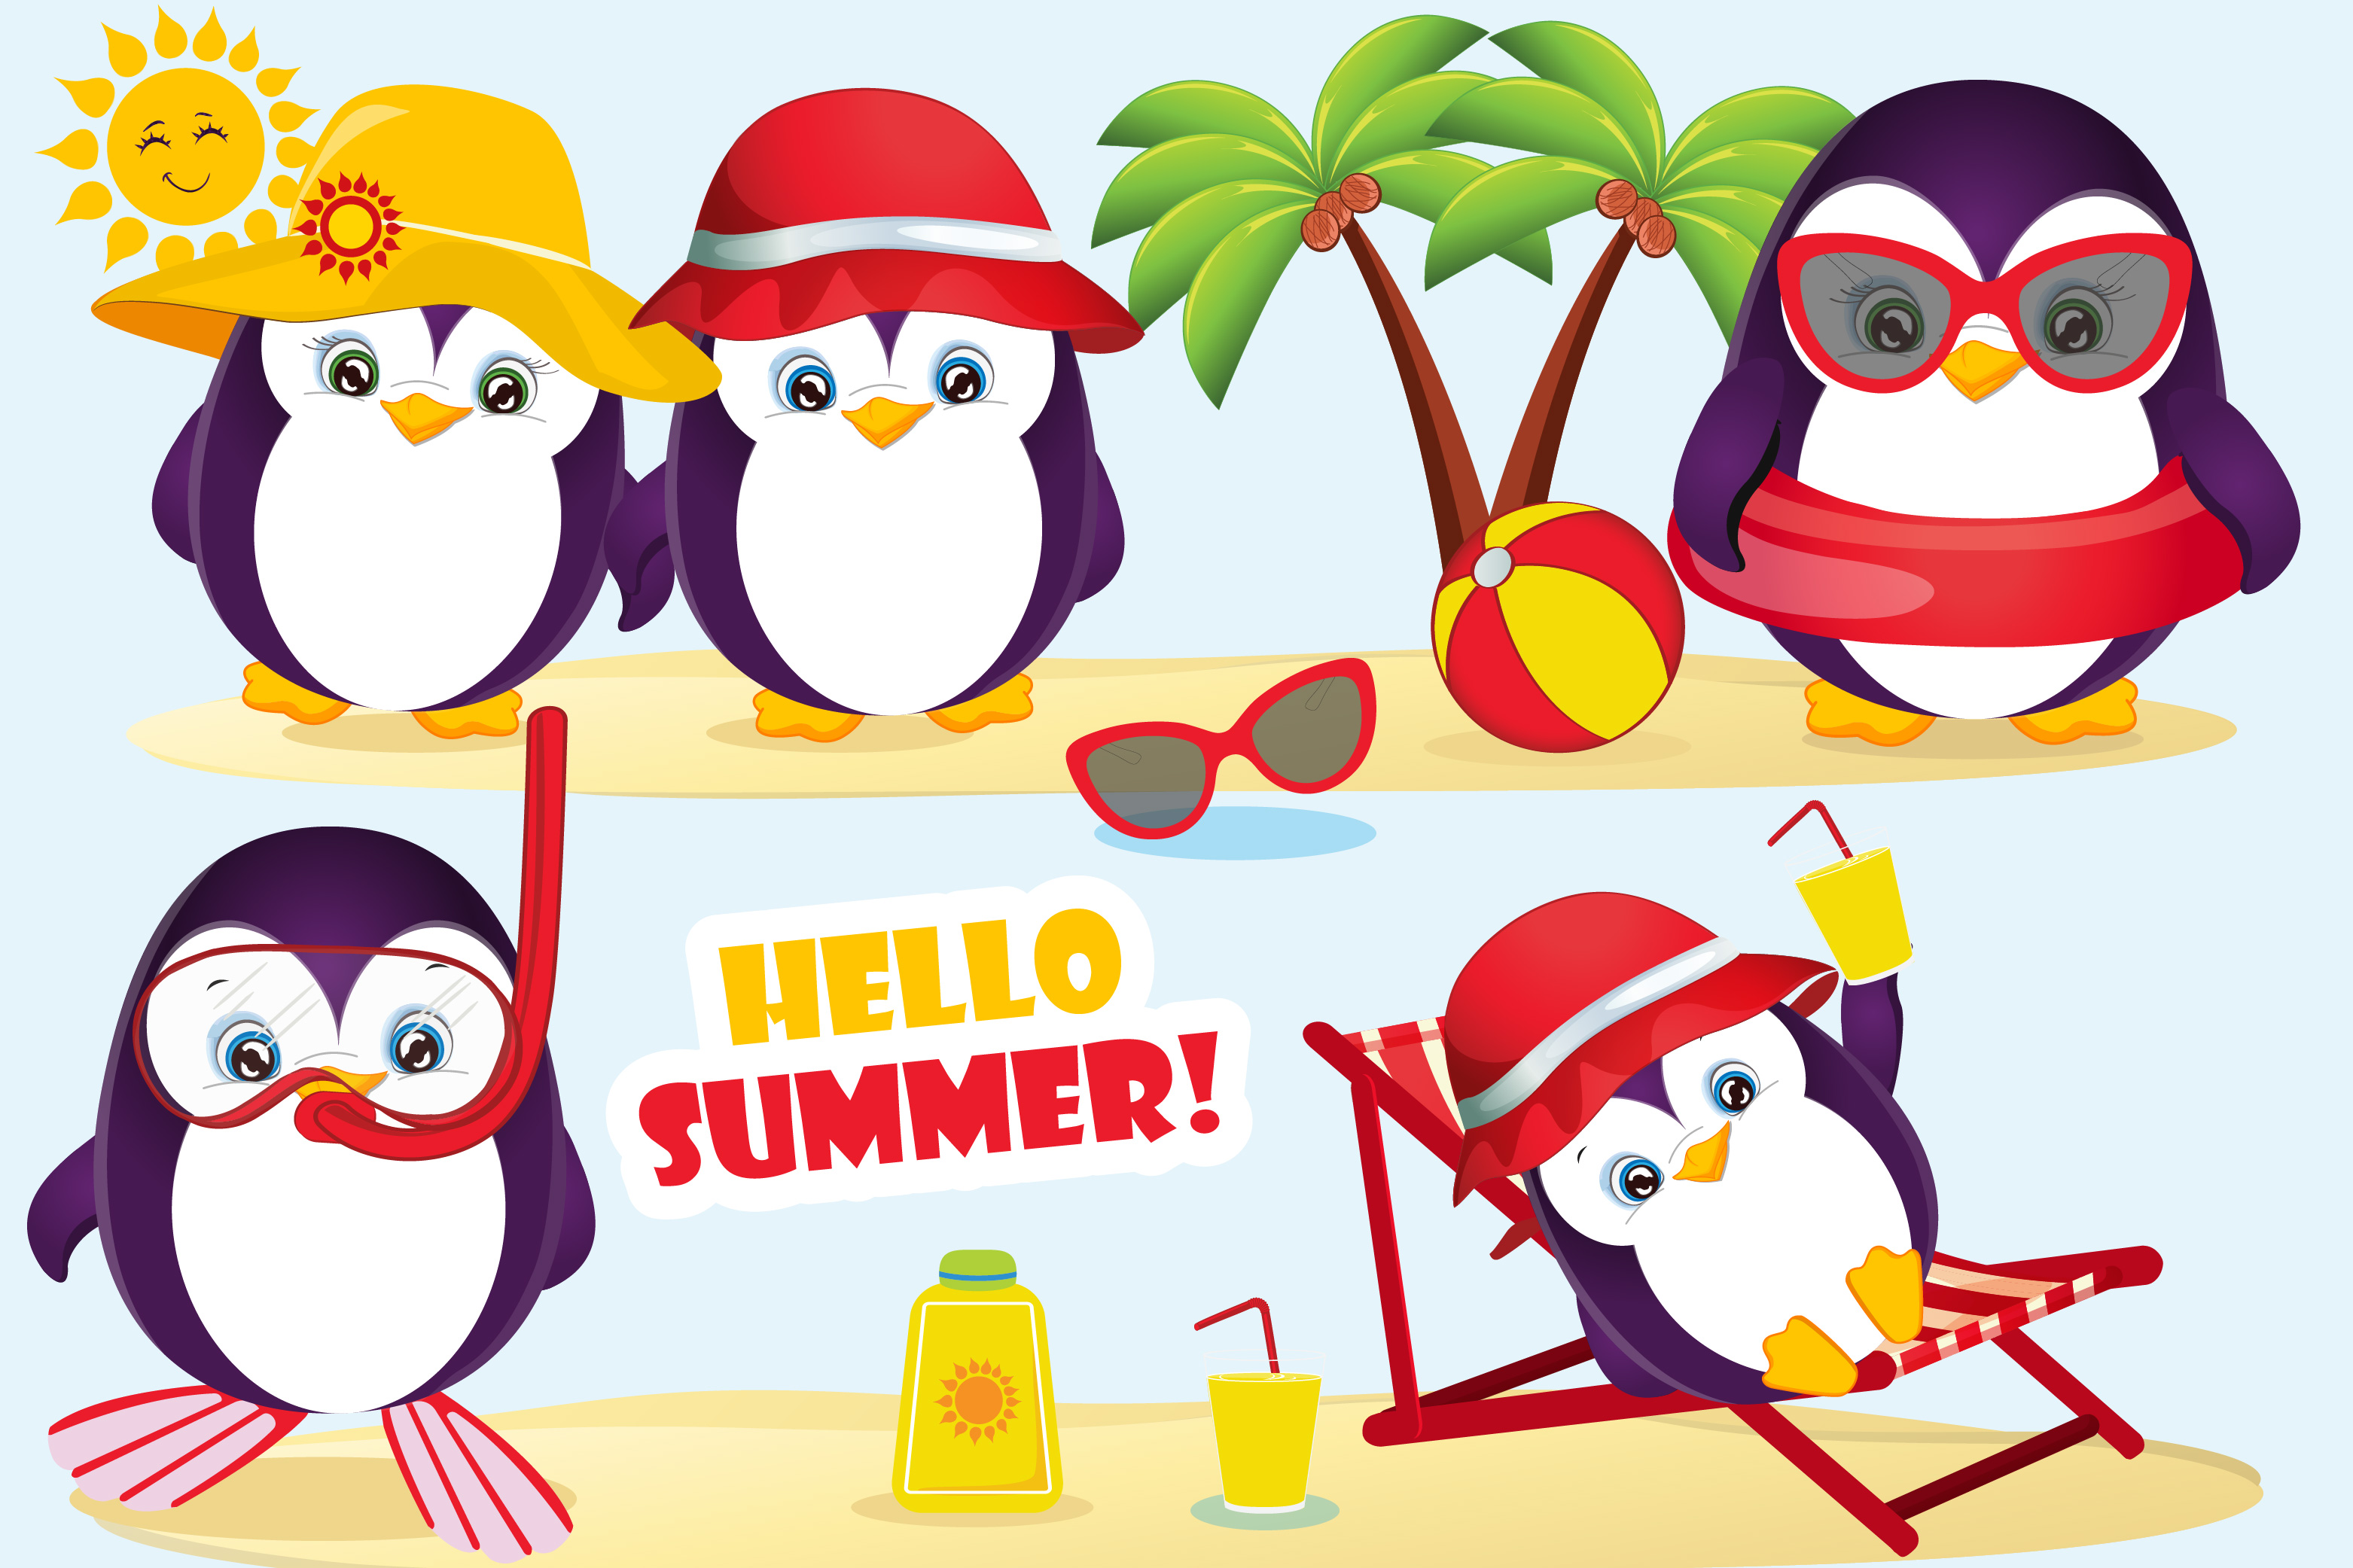 Summer penguin clipart, Summer penguin graphics